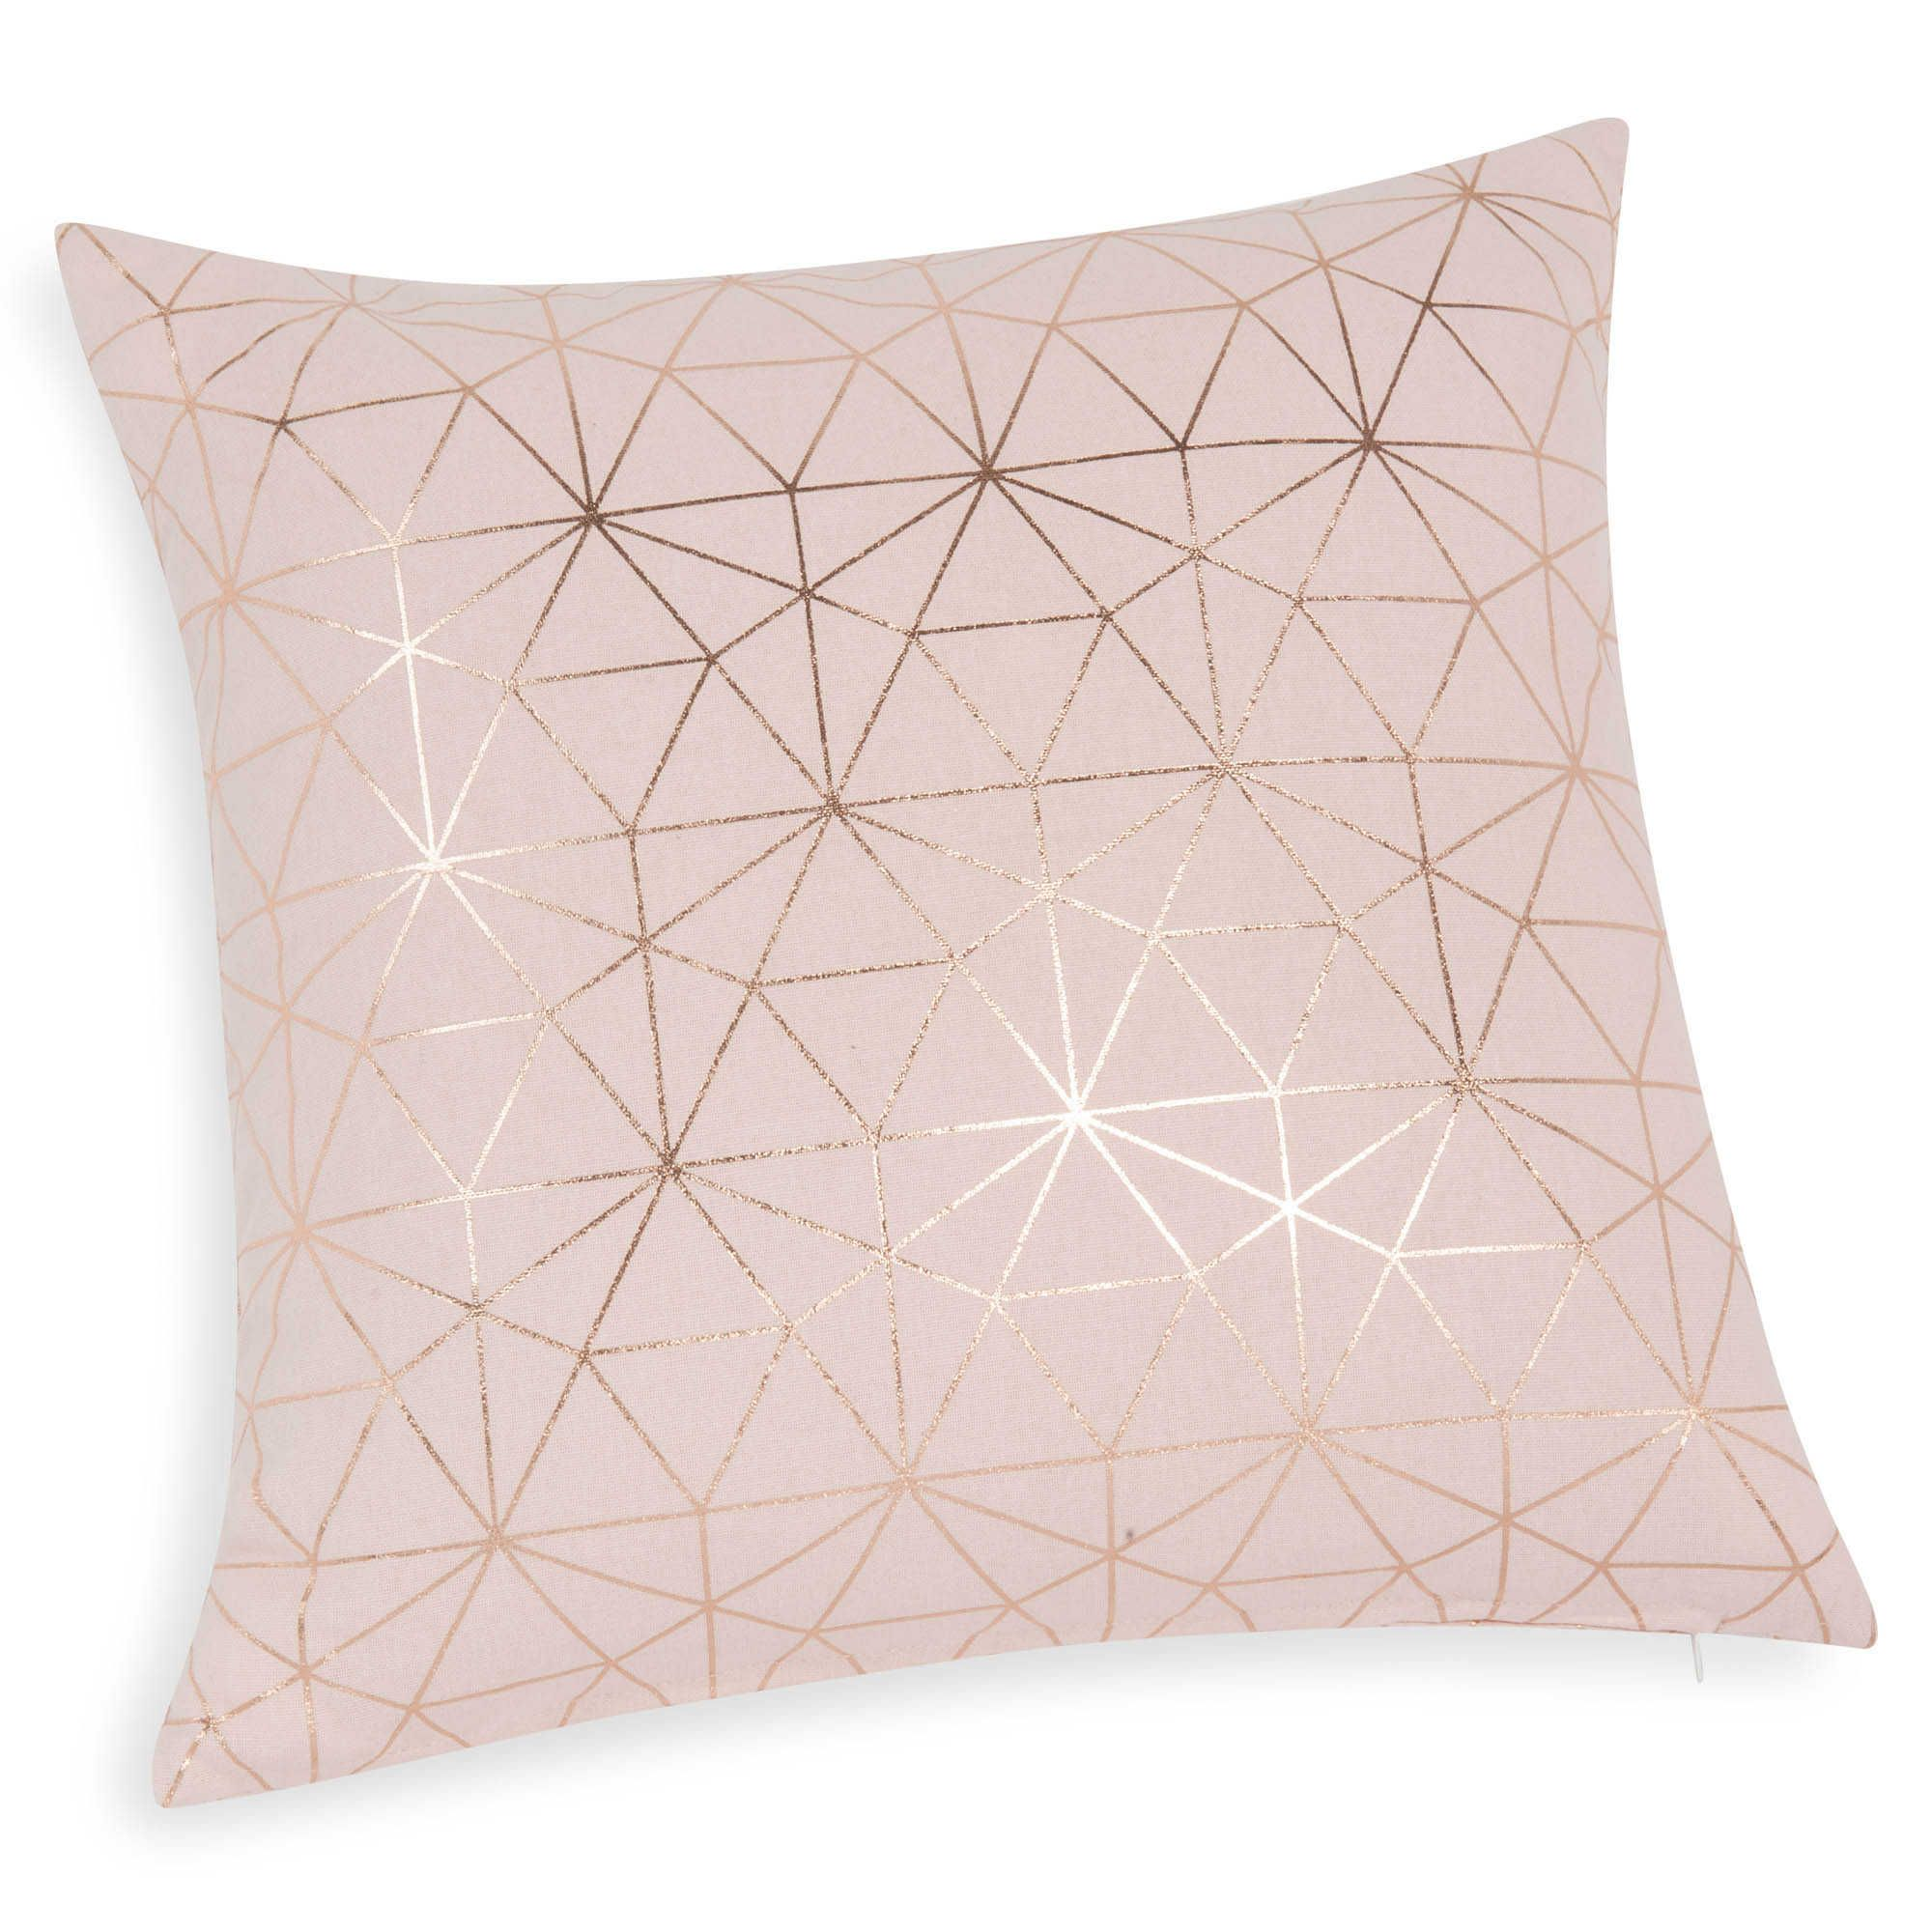 Kissenbezug aus rosafarbener baumwolle 40 x 40 cm magix for Rosegold deko